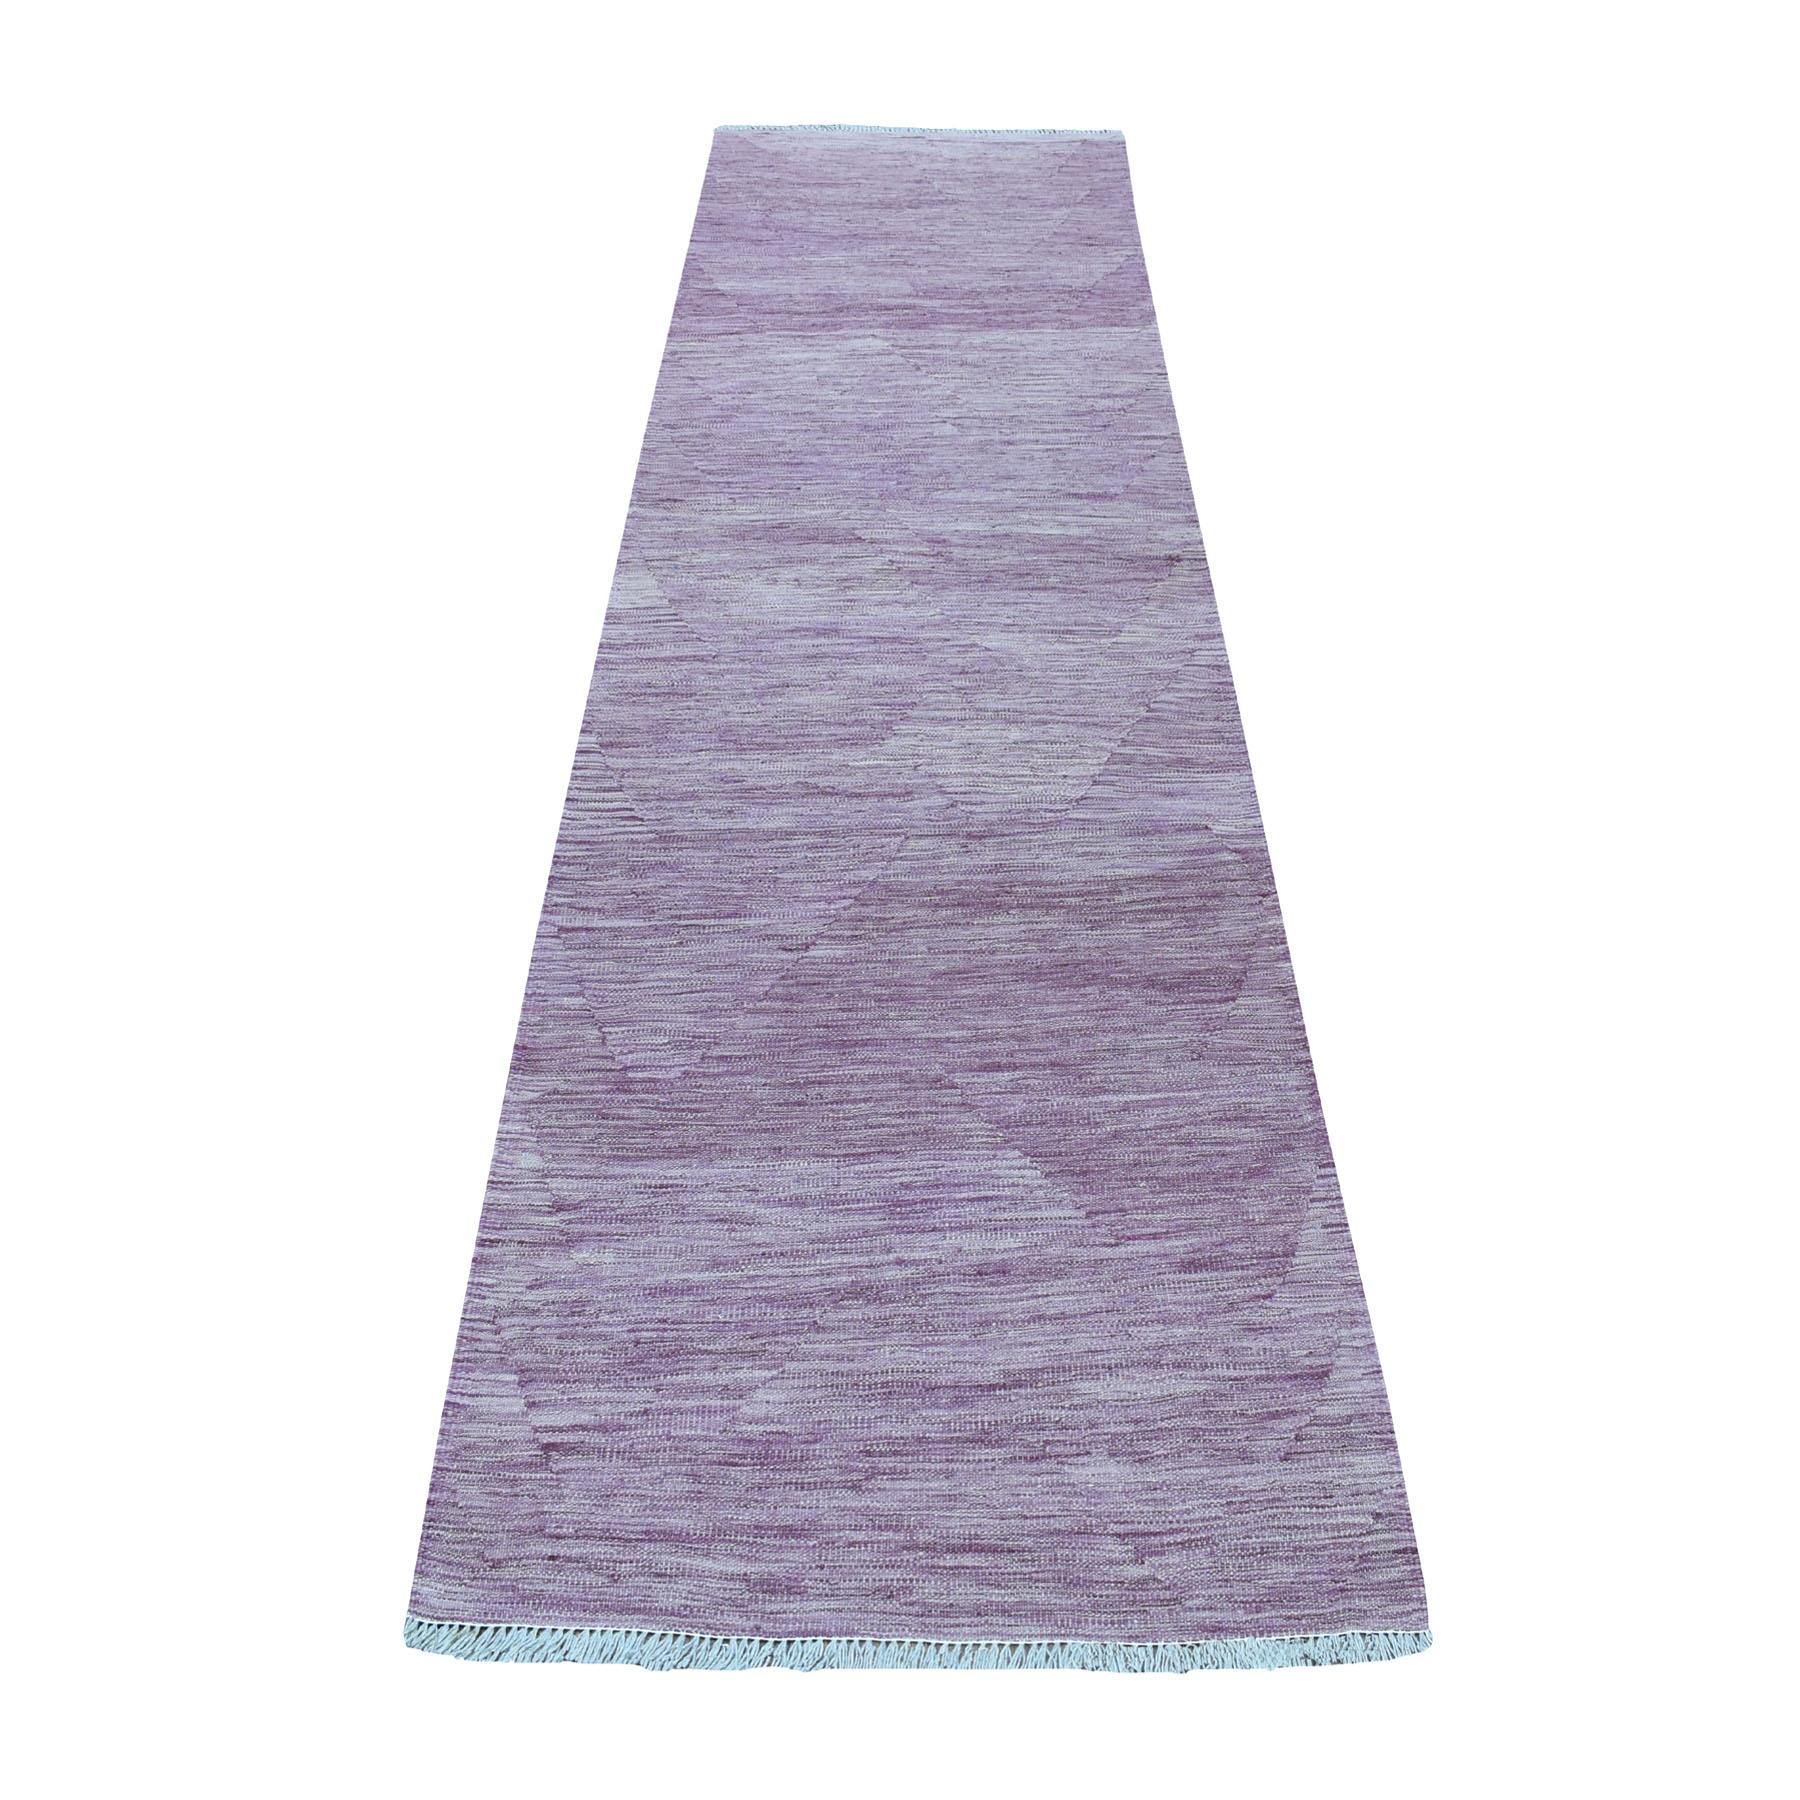 Fine Kilim Collection Hand Woven Purple Rug No: 1107664